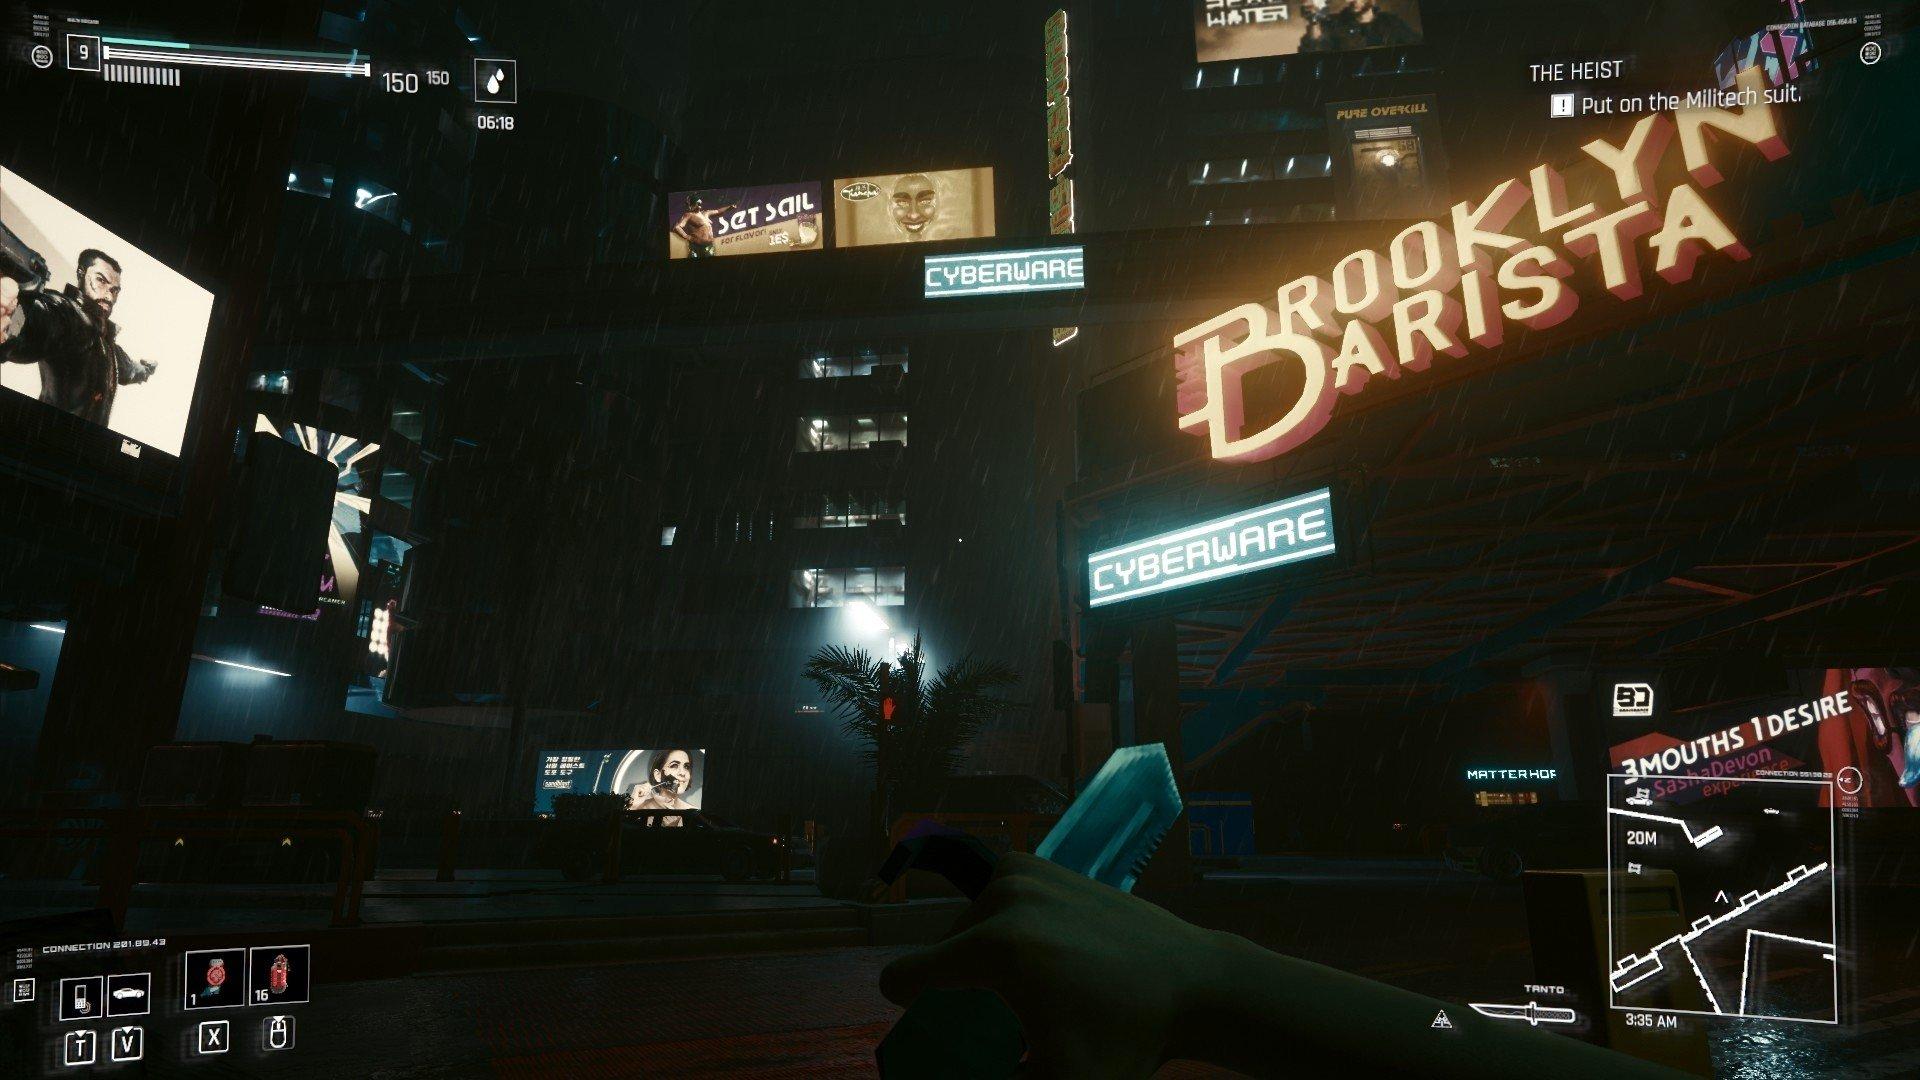 Атмосфера Cyberpunk 2077 стала схожей с Blade Runner